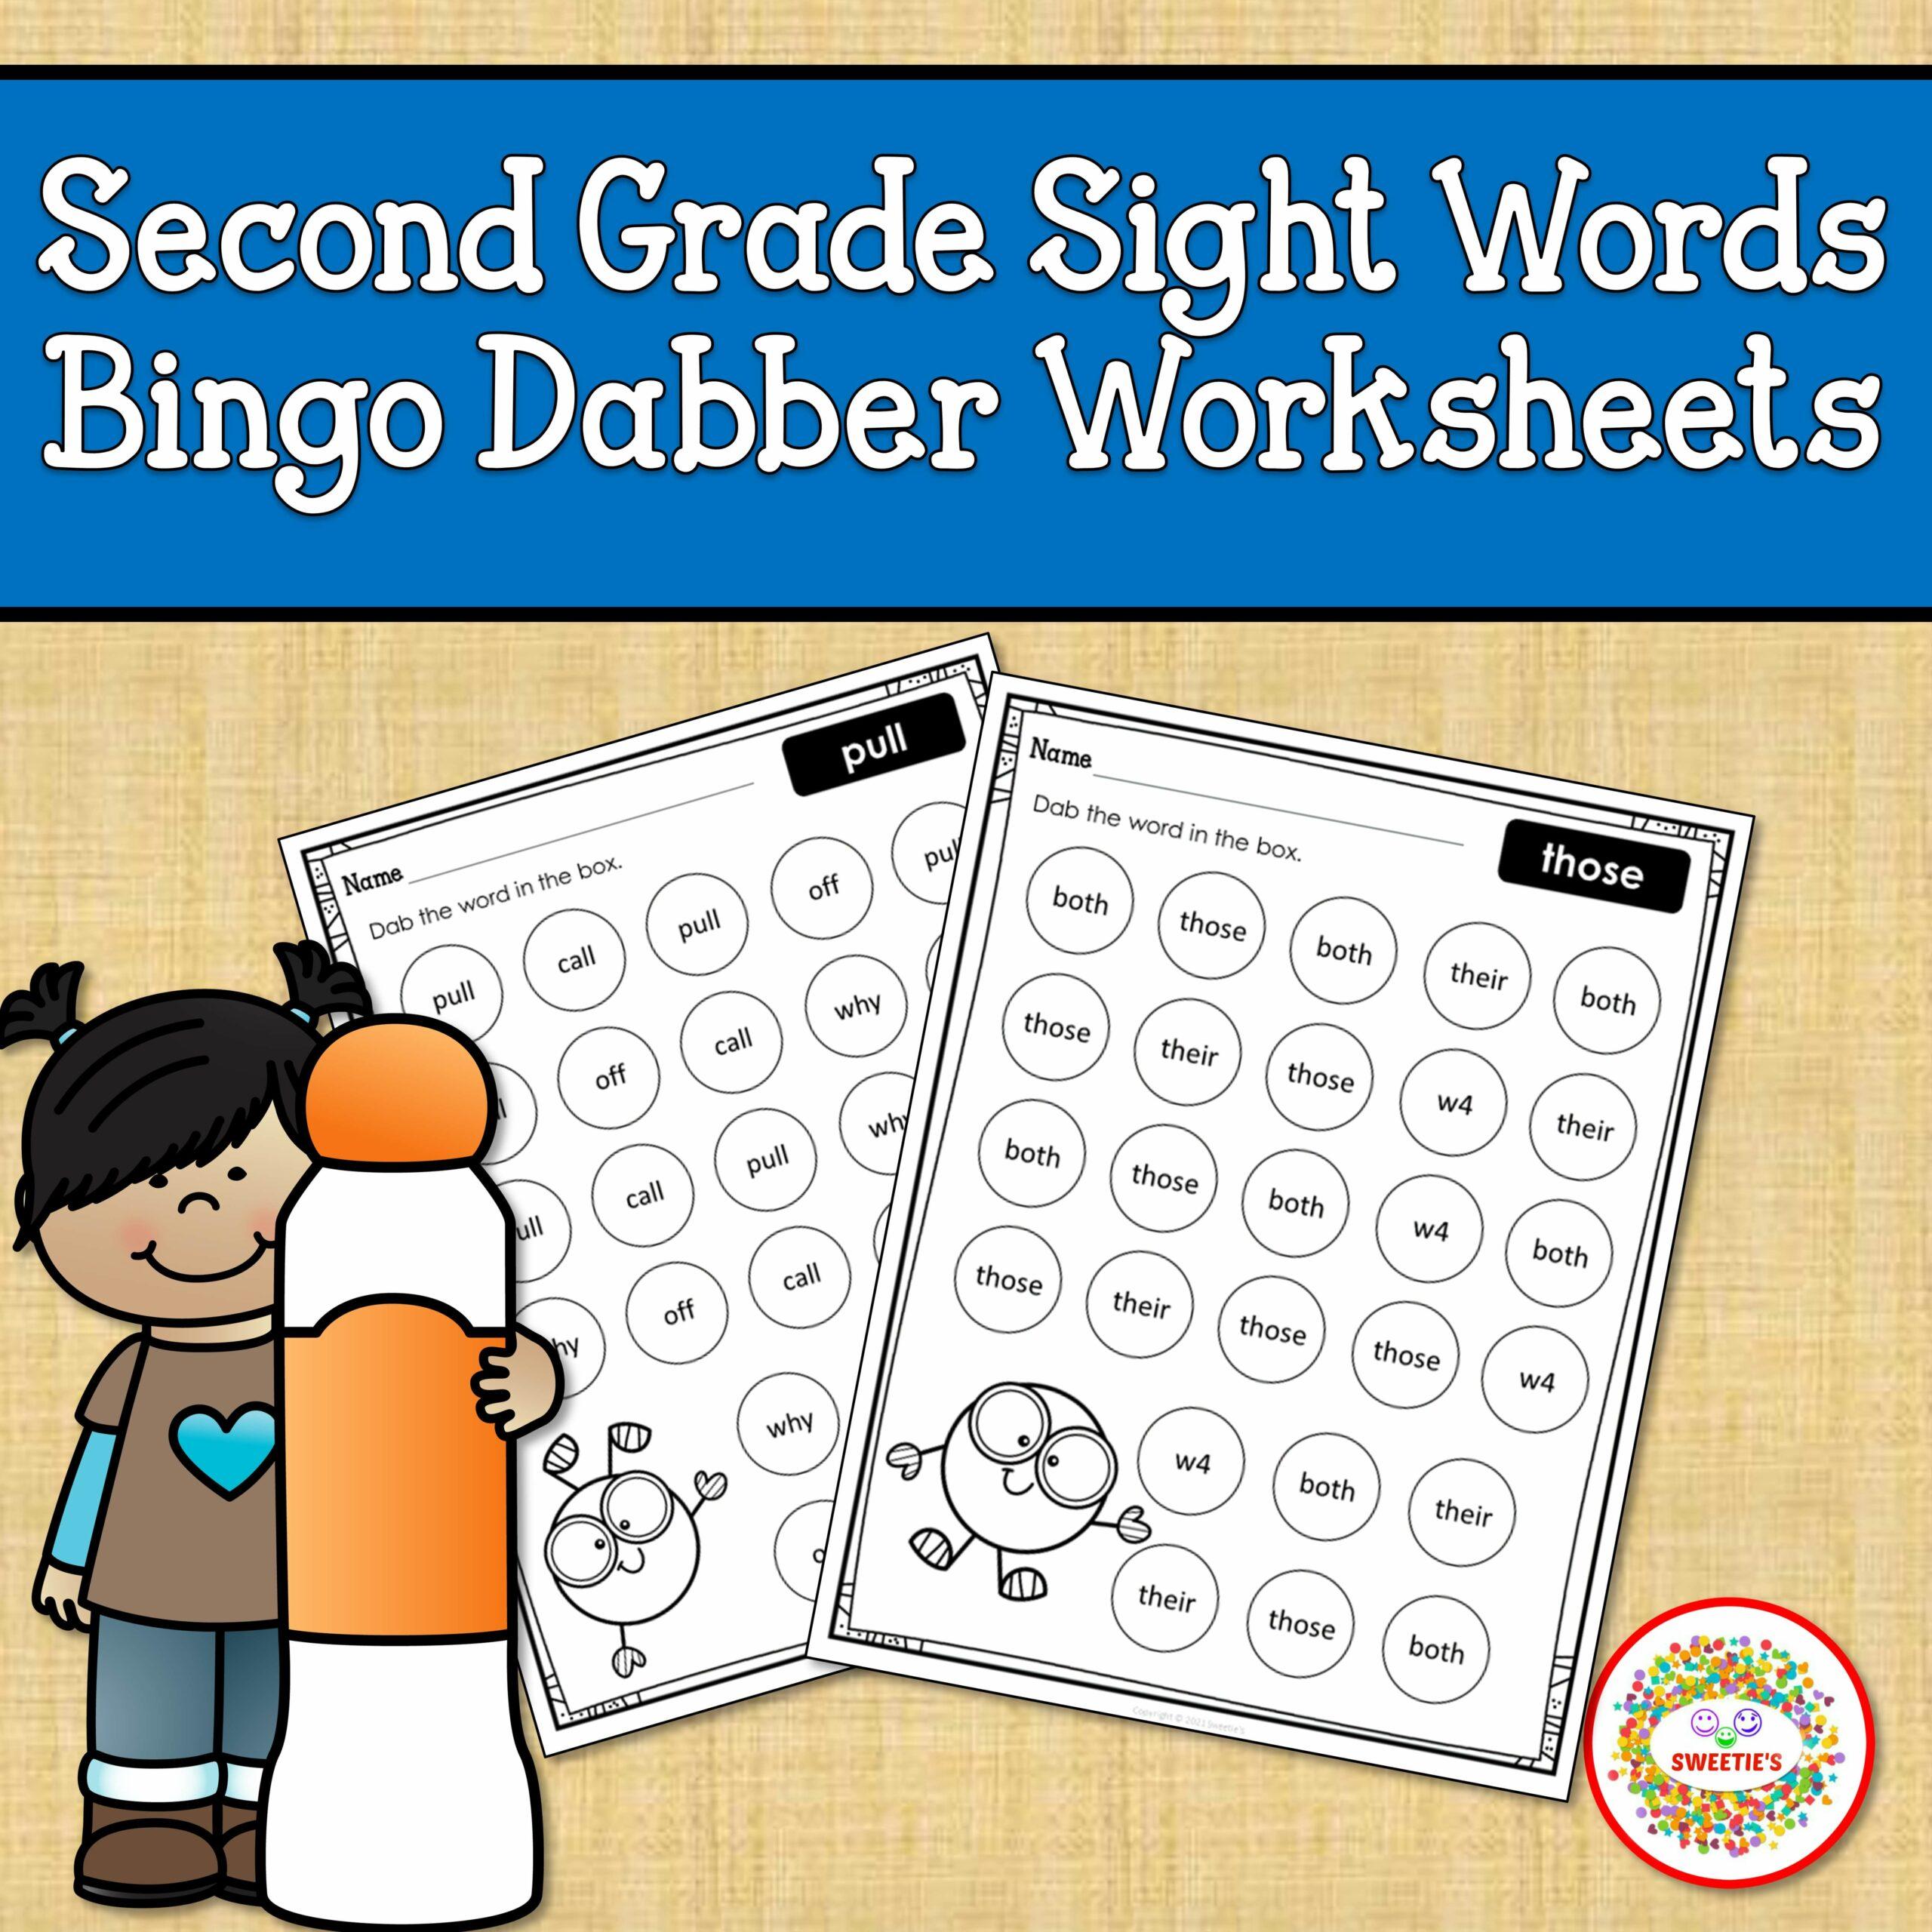 Second Grade Sight Word Bingo Dabber Worksheets